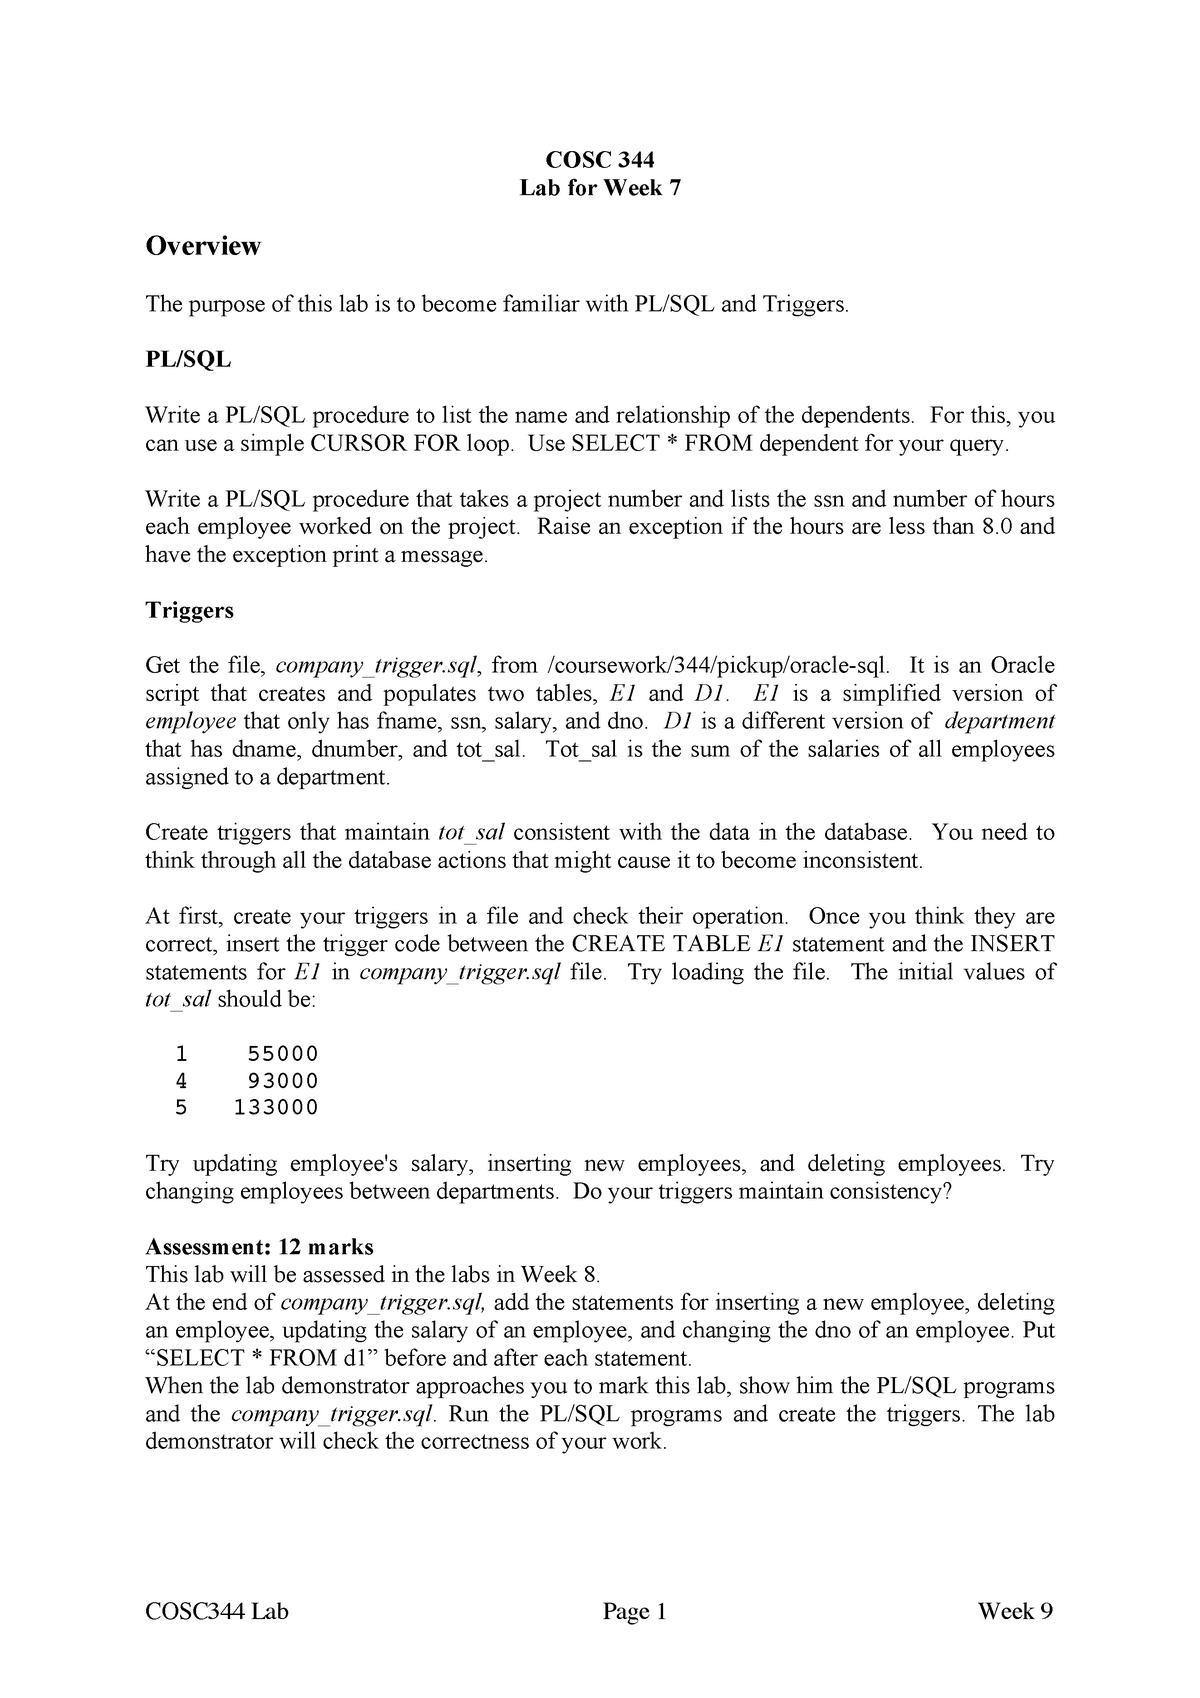 COSC344 2017 Lab 6 - PL-SQL & Triggers - COSC344: Database